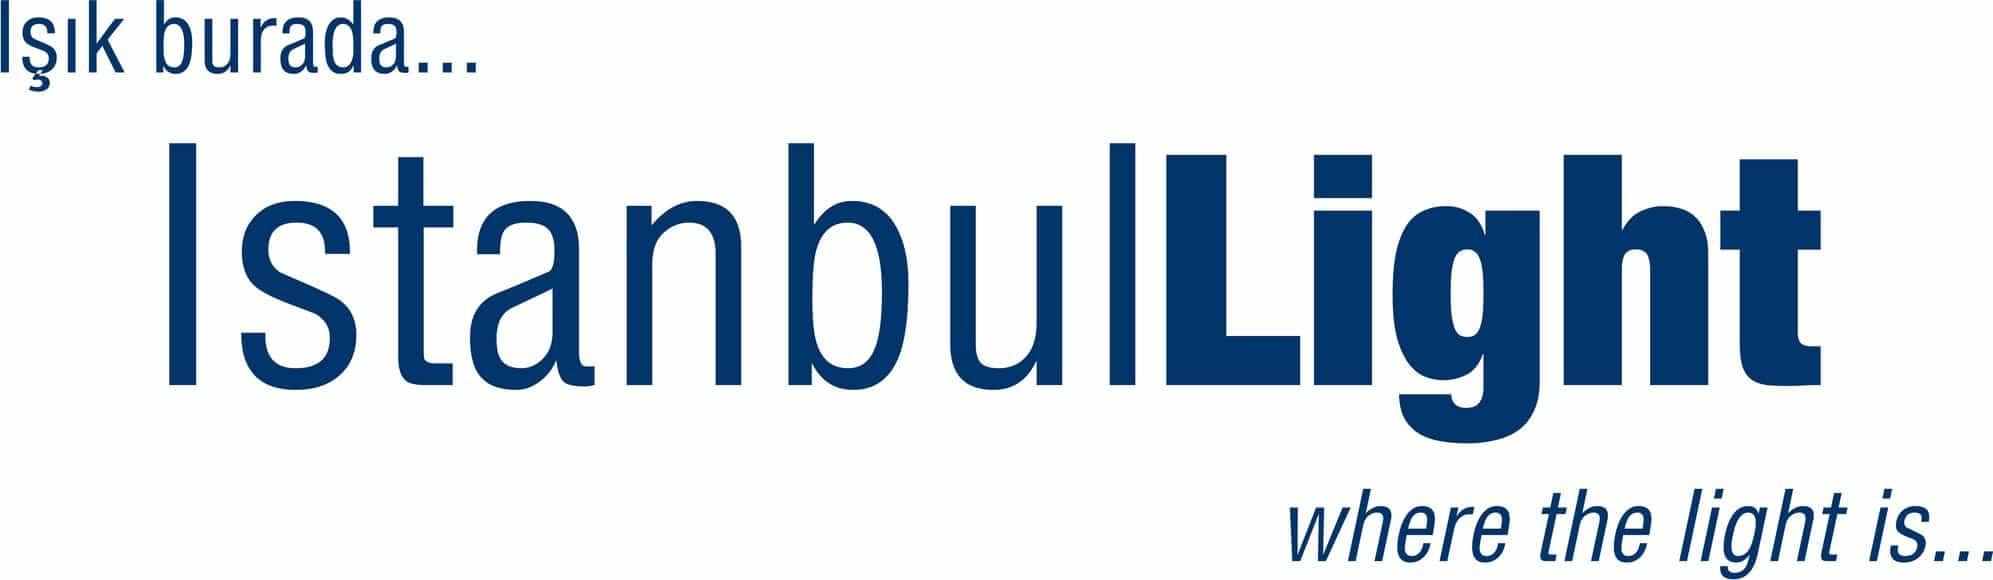 istanbullight logo